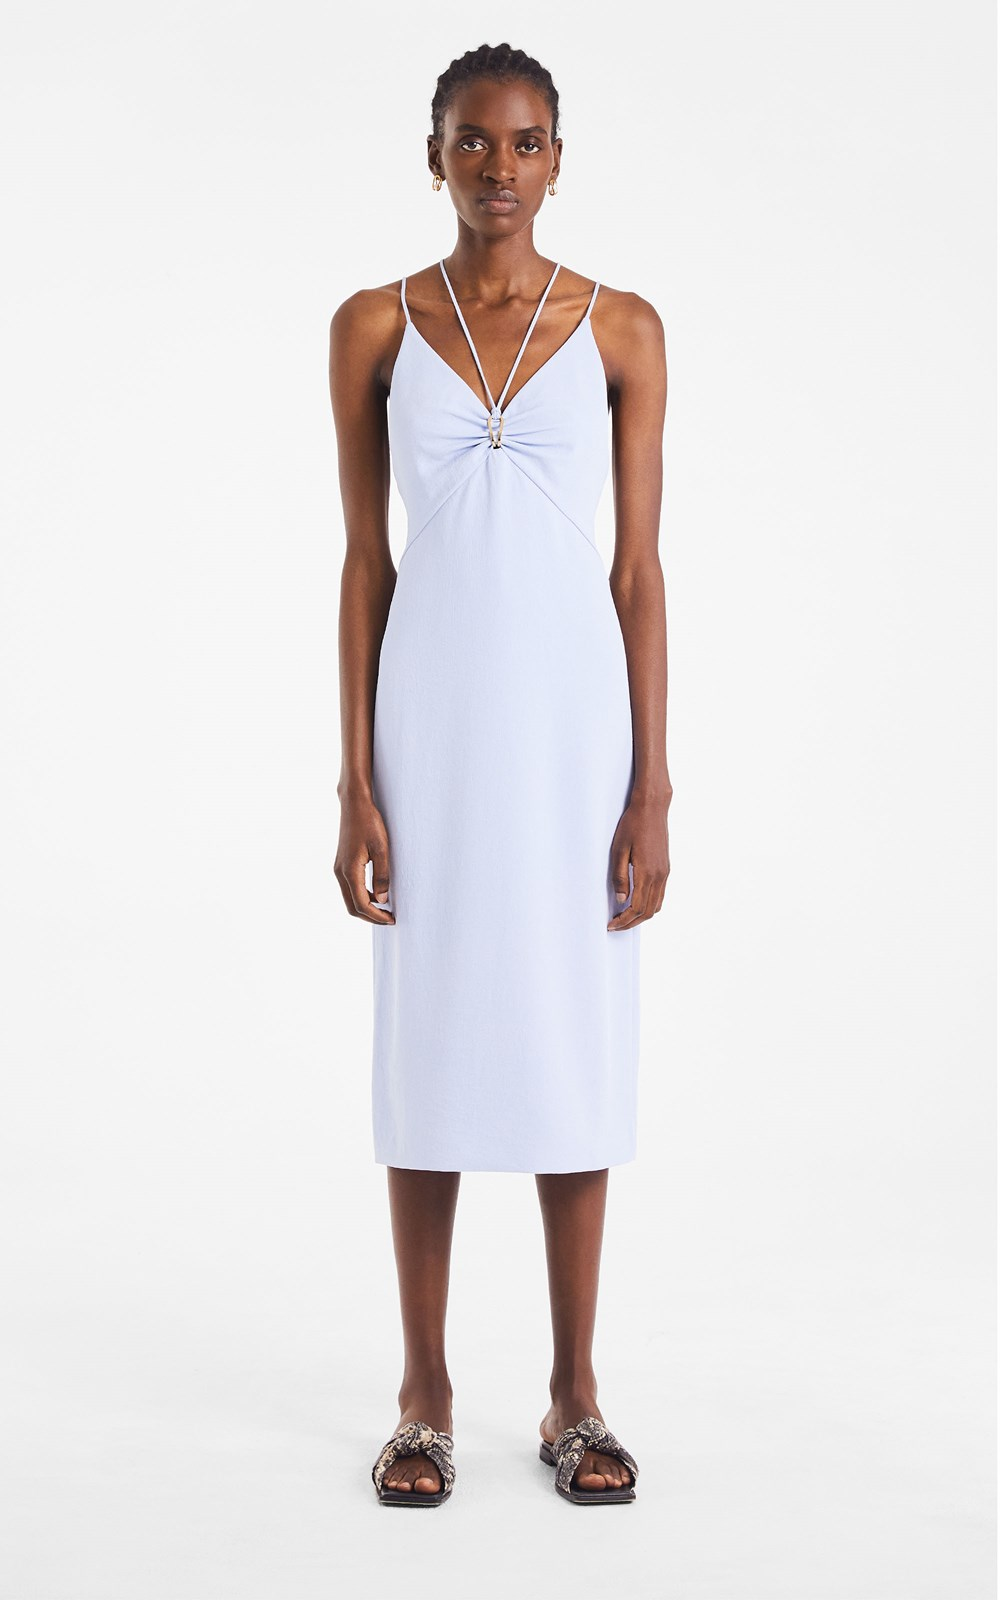 New  | WHITEWASH LINK SLIP DRESS